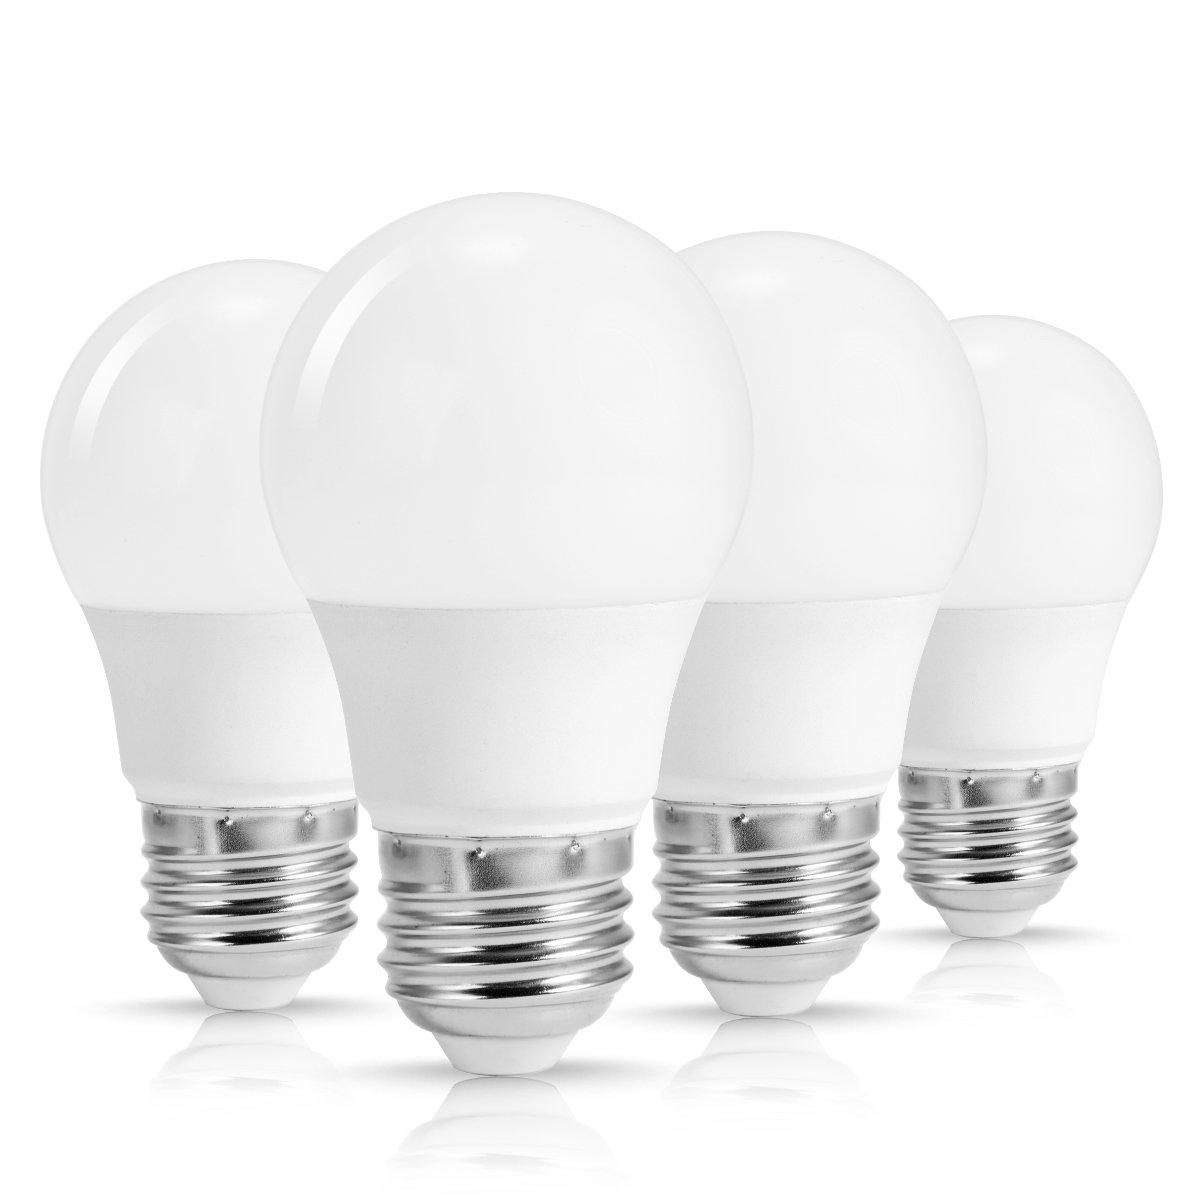 techgomade a15 LED電球5 W (40 Wハロゲン同等)、デイライト、ホワイト5000 K、e26ミディアムベースライト電球、12 V AC/DC、450lumens、a15 /g45形状装飾エジソン電球ホーム照明4パック B07DDBRSP6